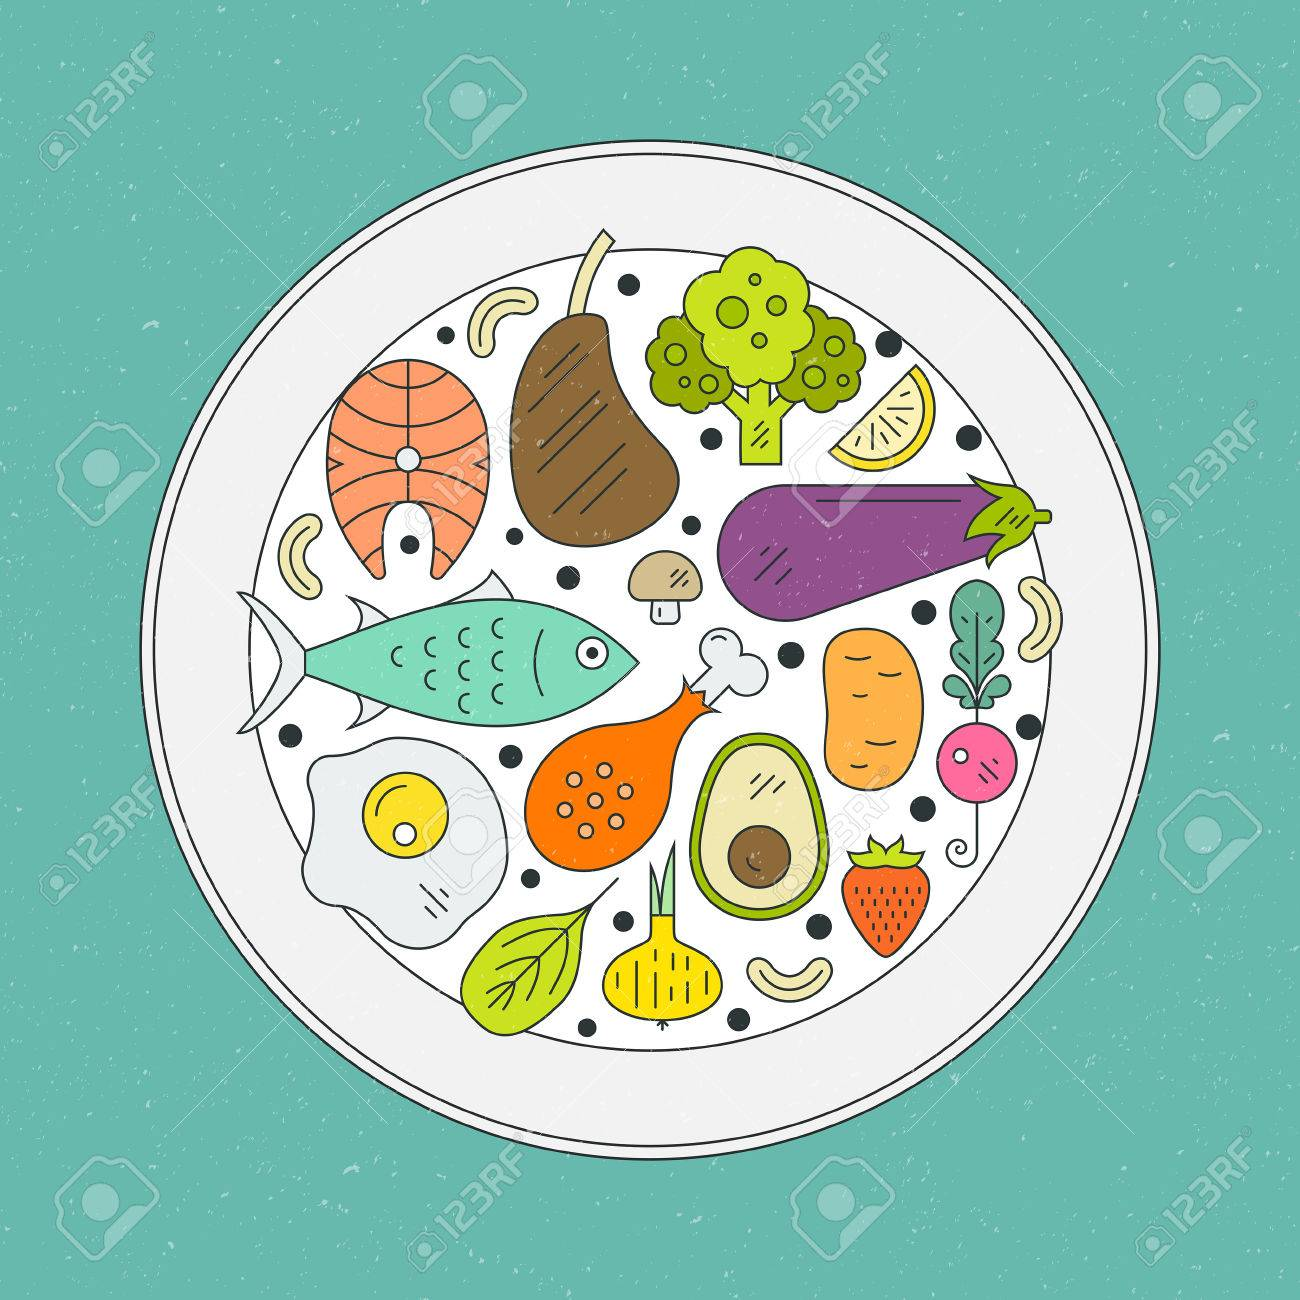 la dieta paleo es saludable